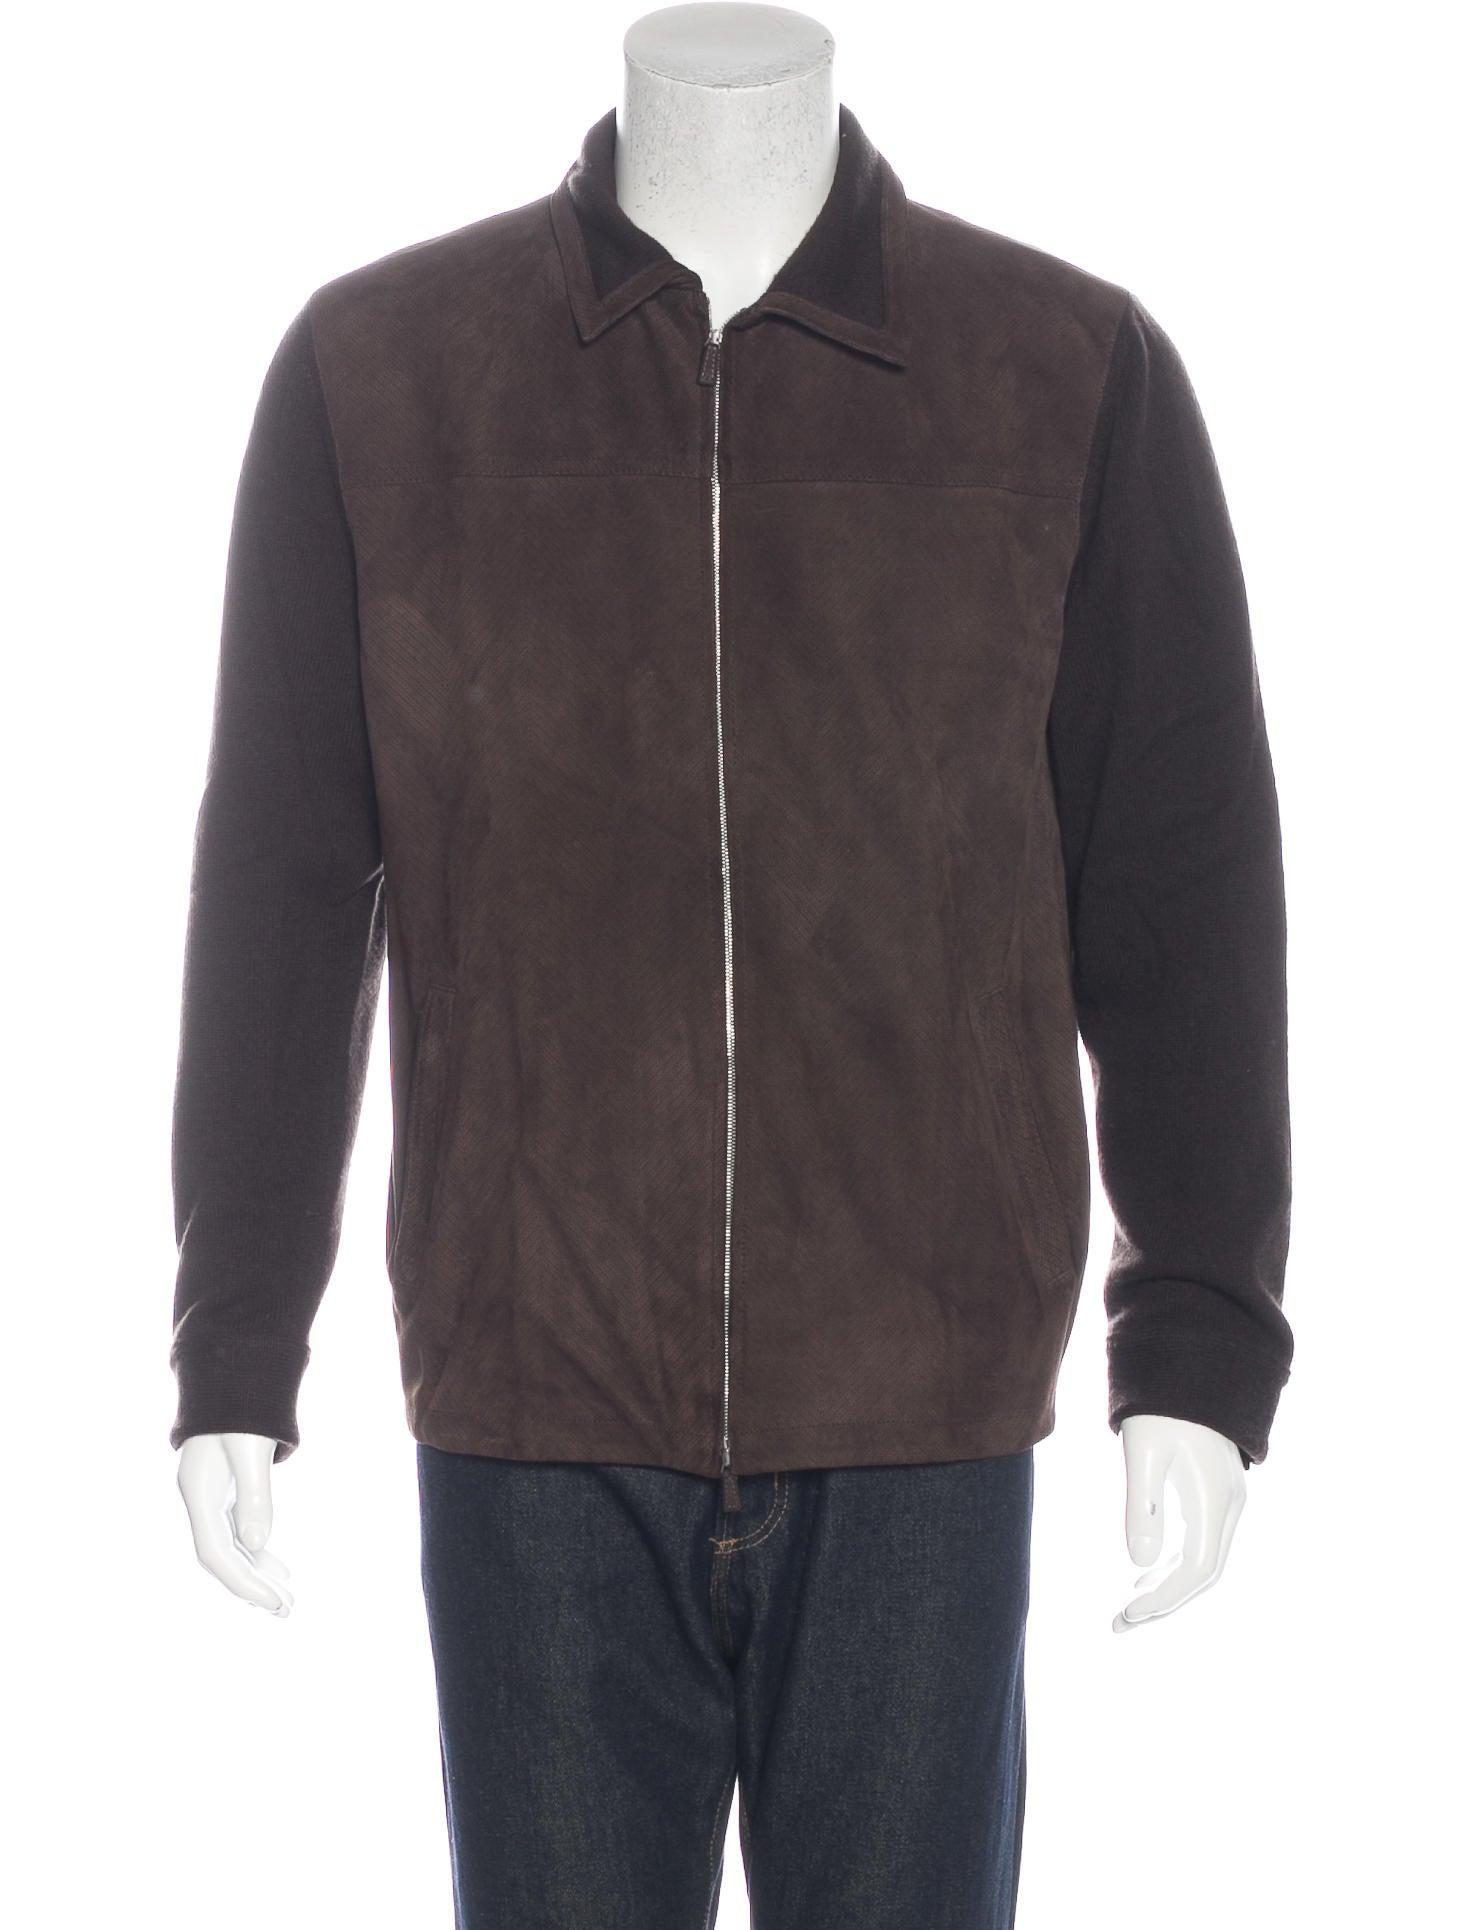 Ermenegildo zegna leather jacket